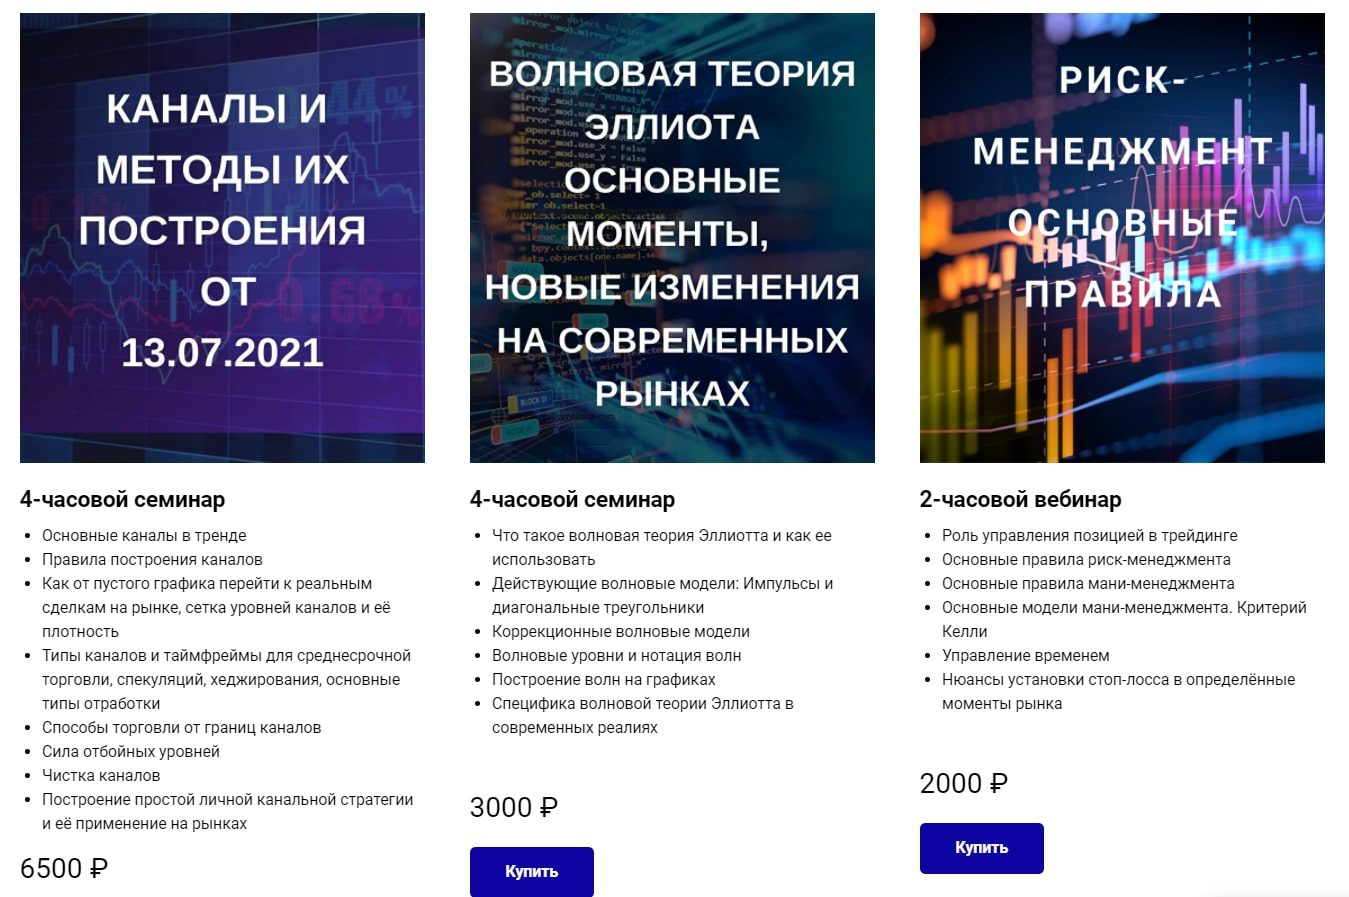 Стоимость услуг у Романа Андреева